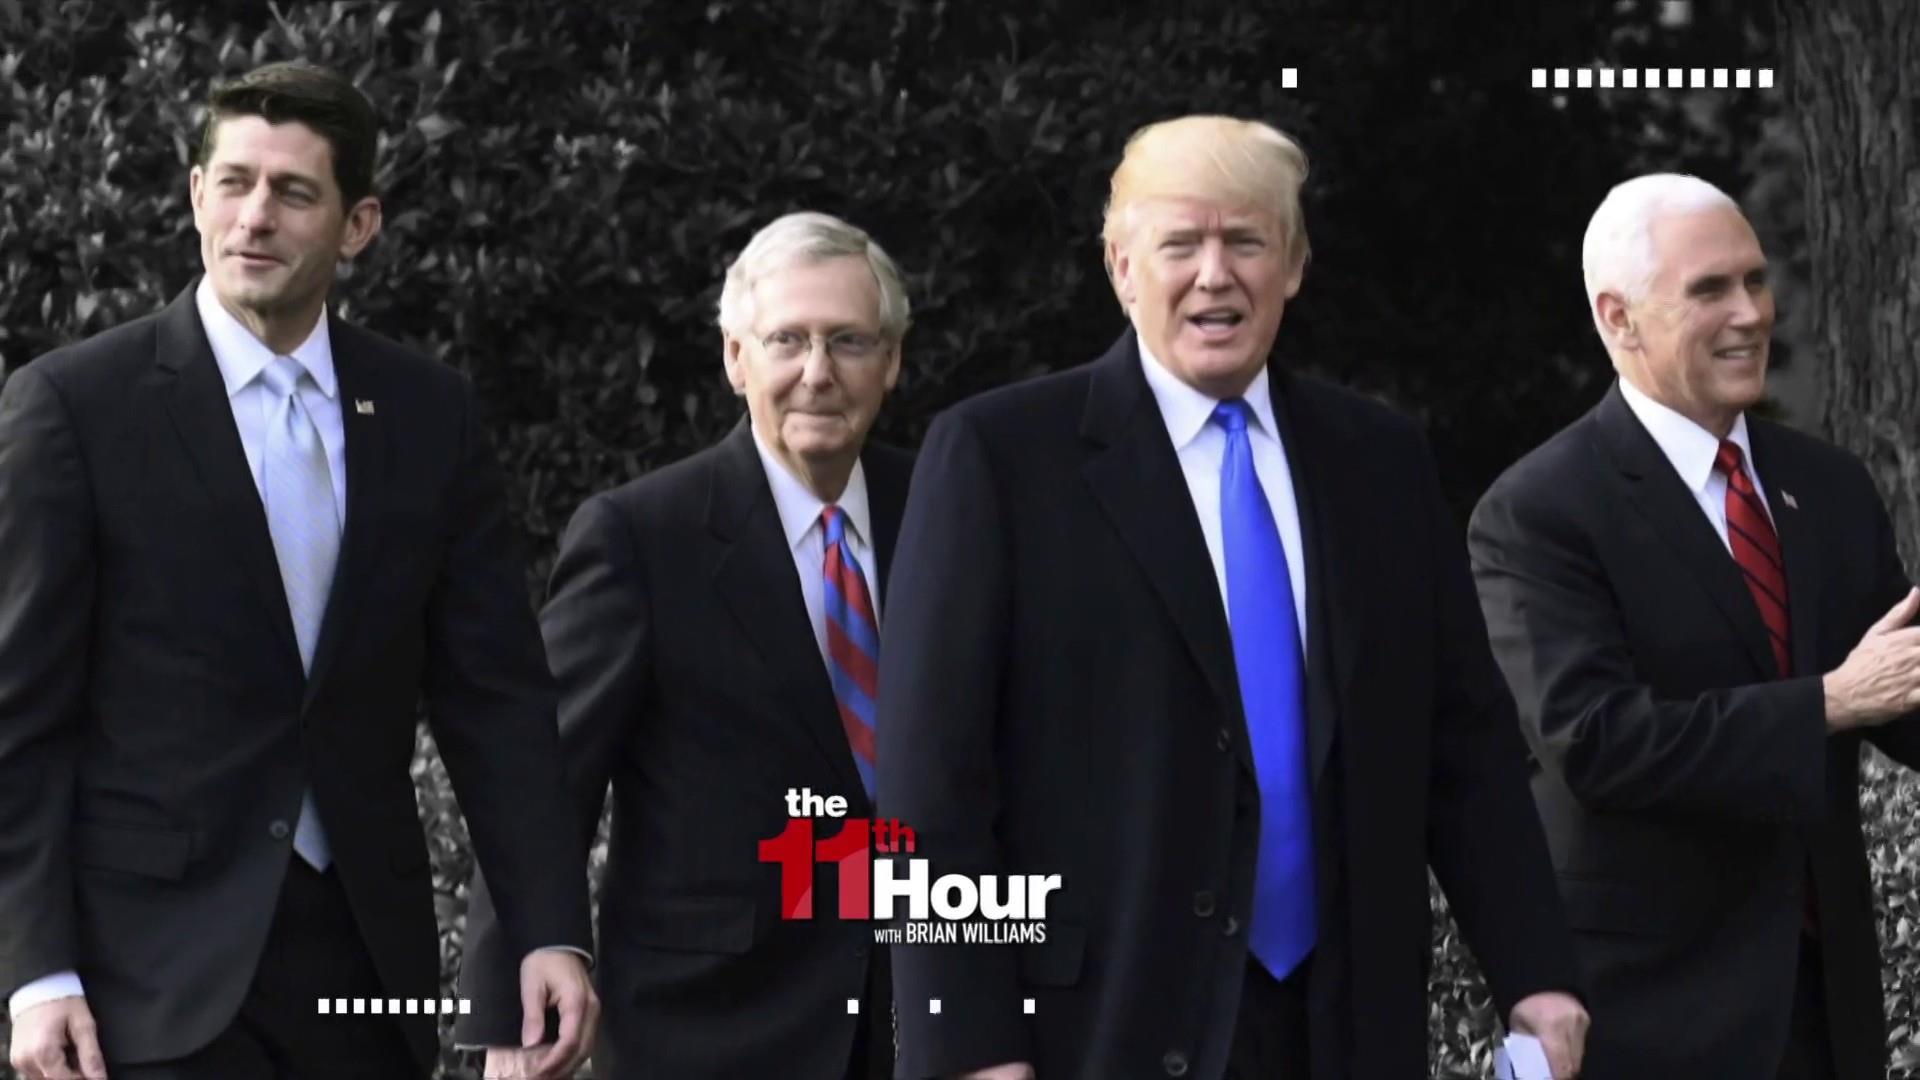 Despite bragging, Trump lags behind past presidents